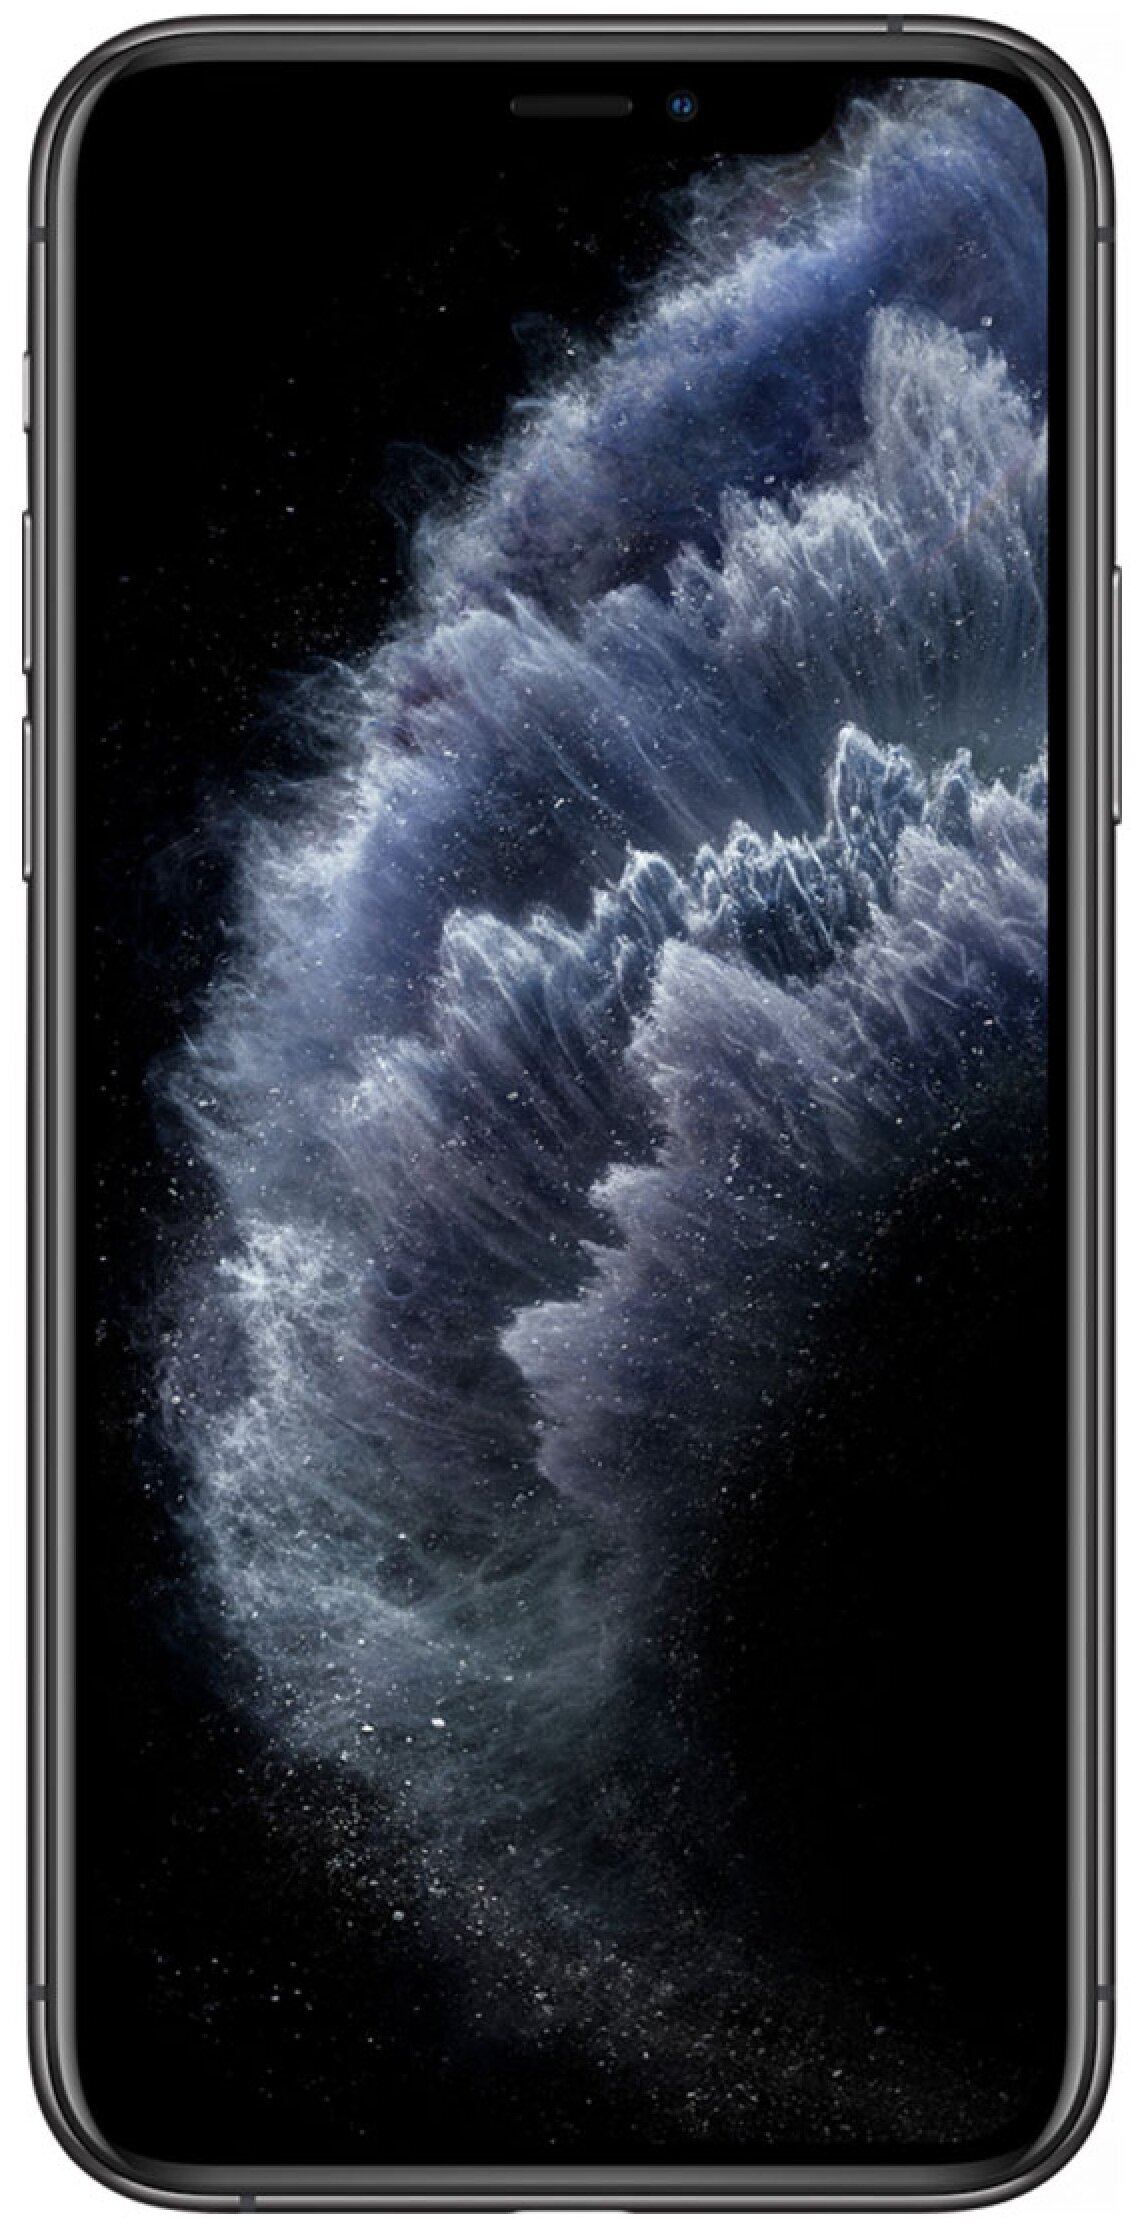 Apple iPhone 11 Pro 512GB - 3камеры: 12МП, 12МП, 12МП